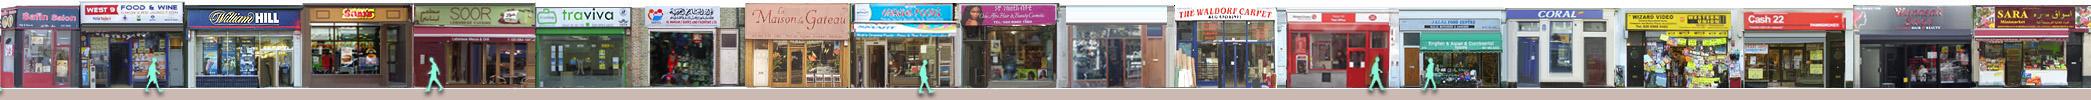 Harrow Road shops